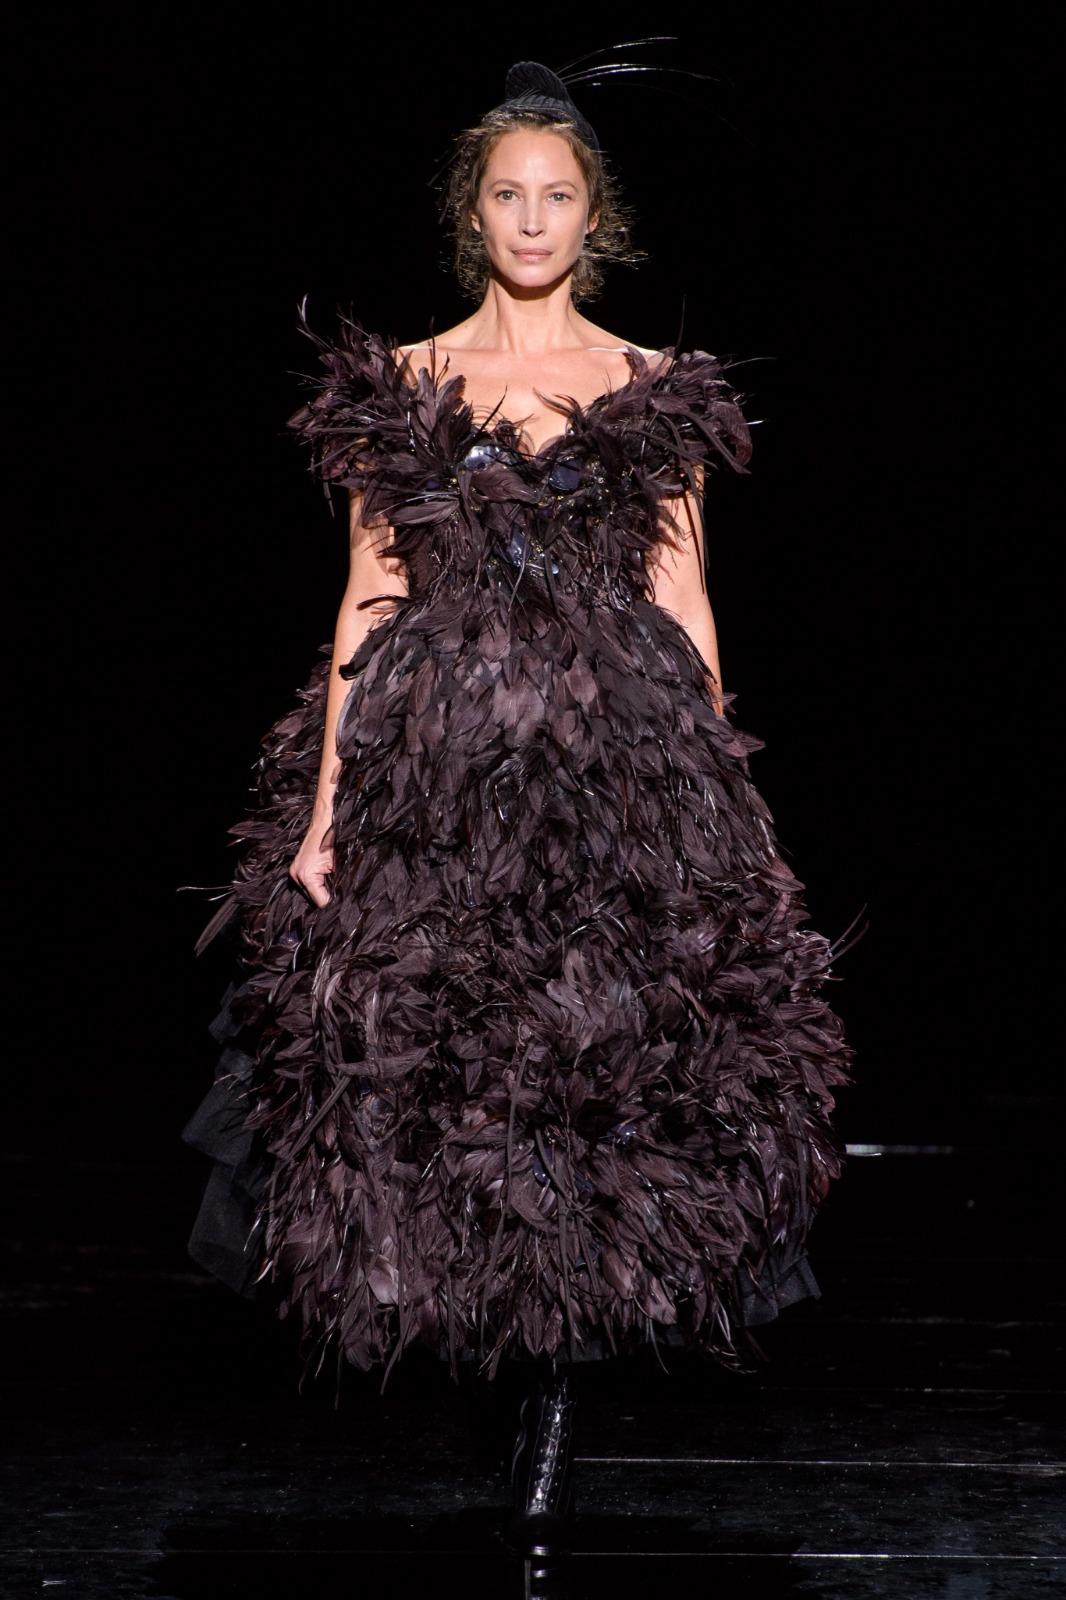 color púrpura de tiro, tendencias otoño invierno 2019, vestido de plumas en color morado oscuro de Marc Jacobs, ultimas tendencias en moda mujer